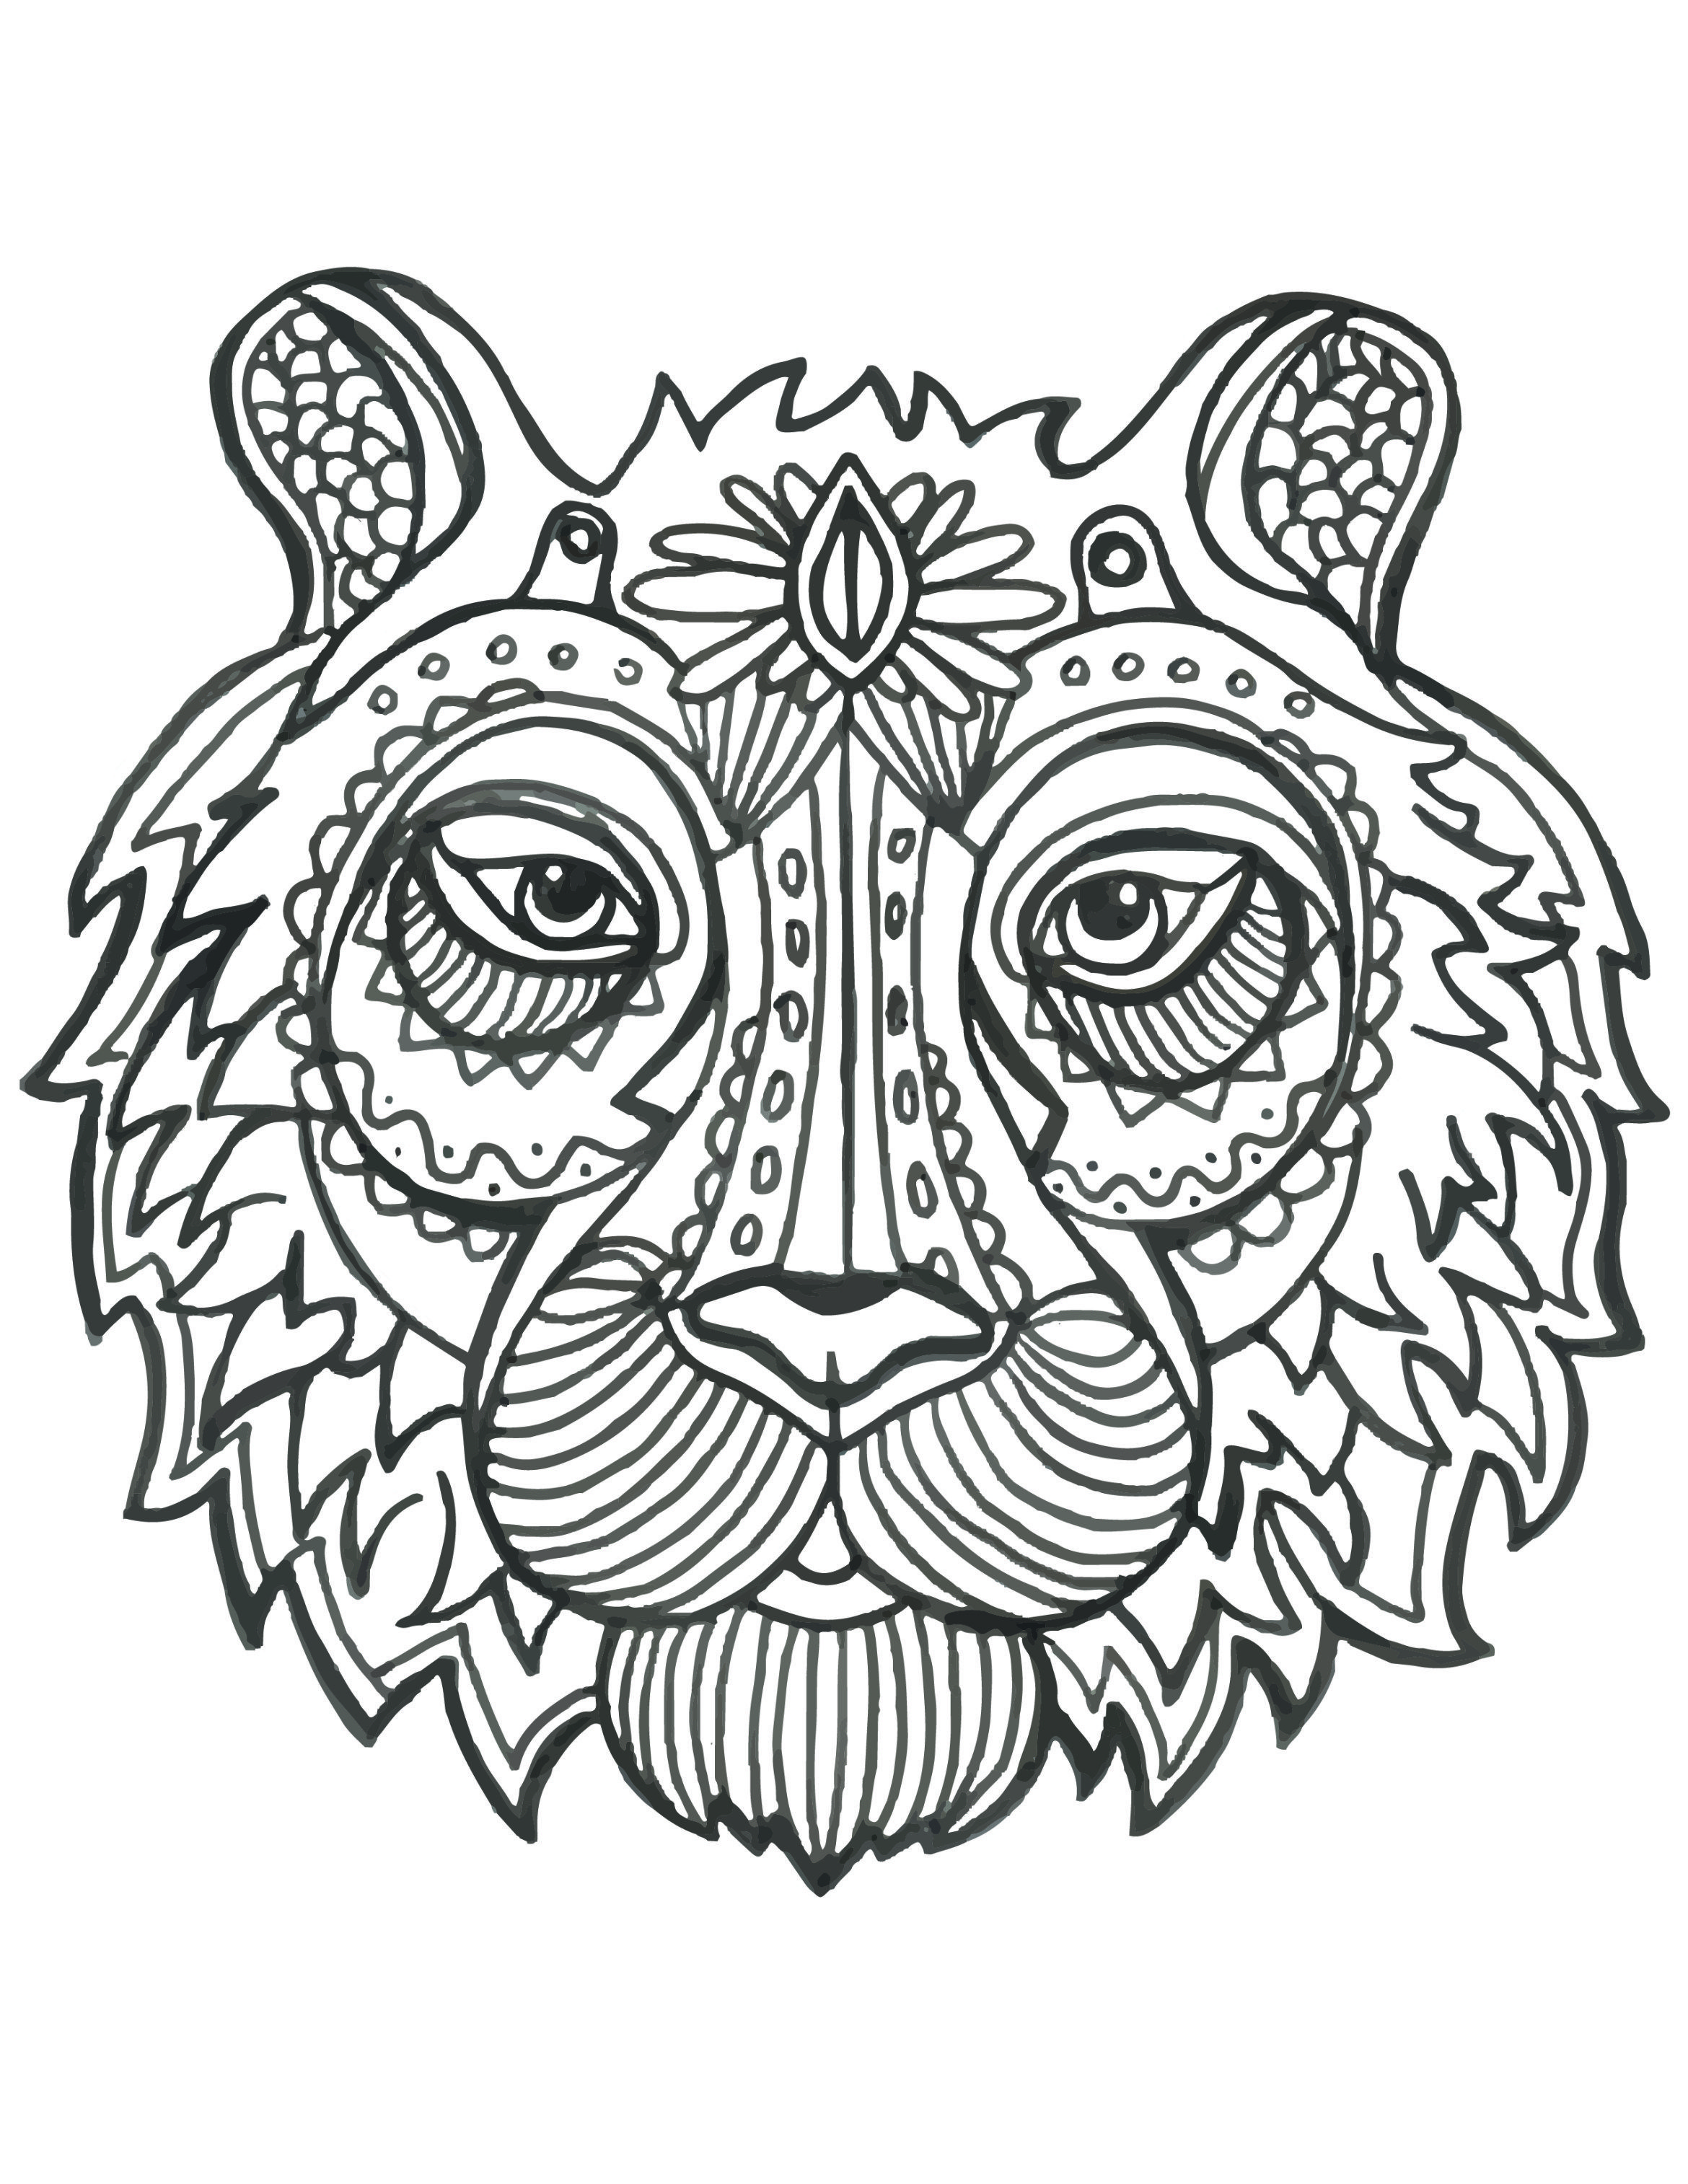 Coloriage De Animaux Tete De Tigre A Imprimer Animal Coloring